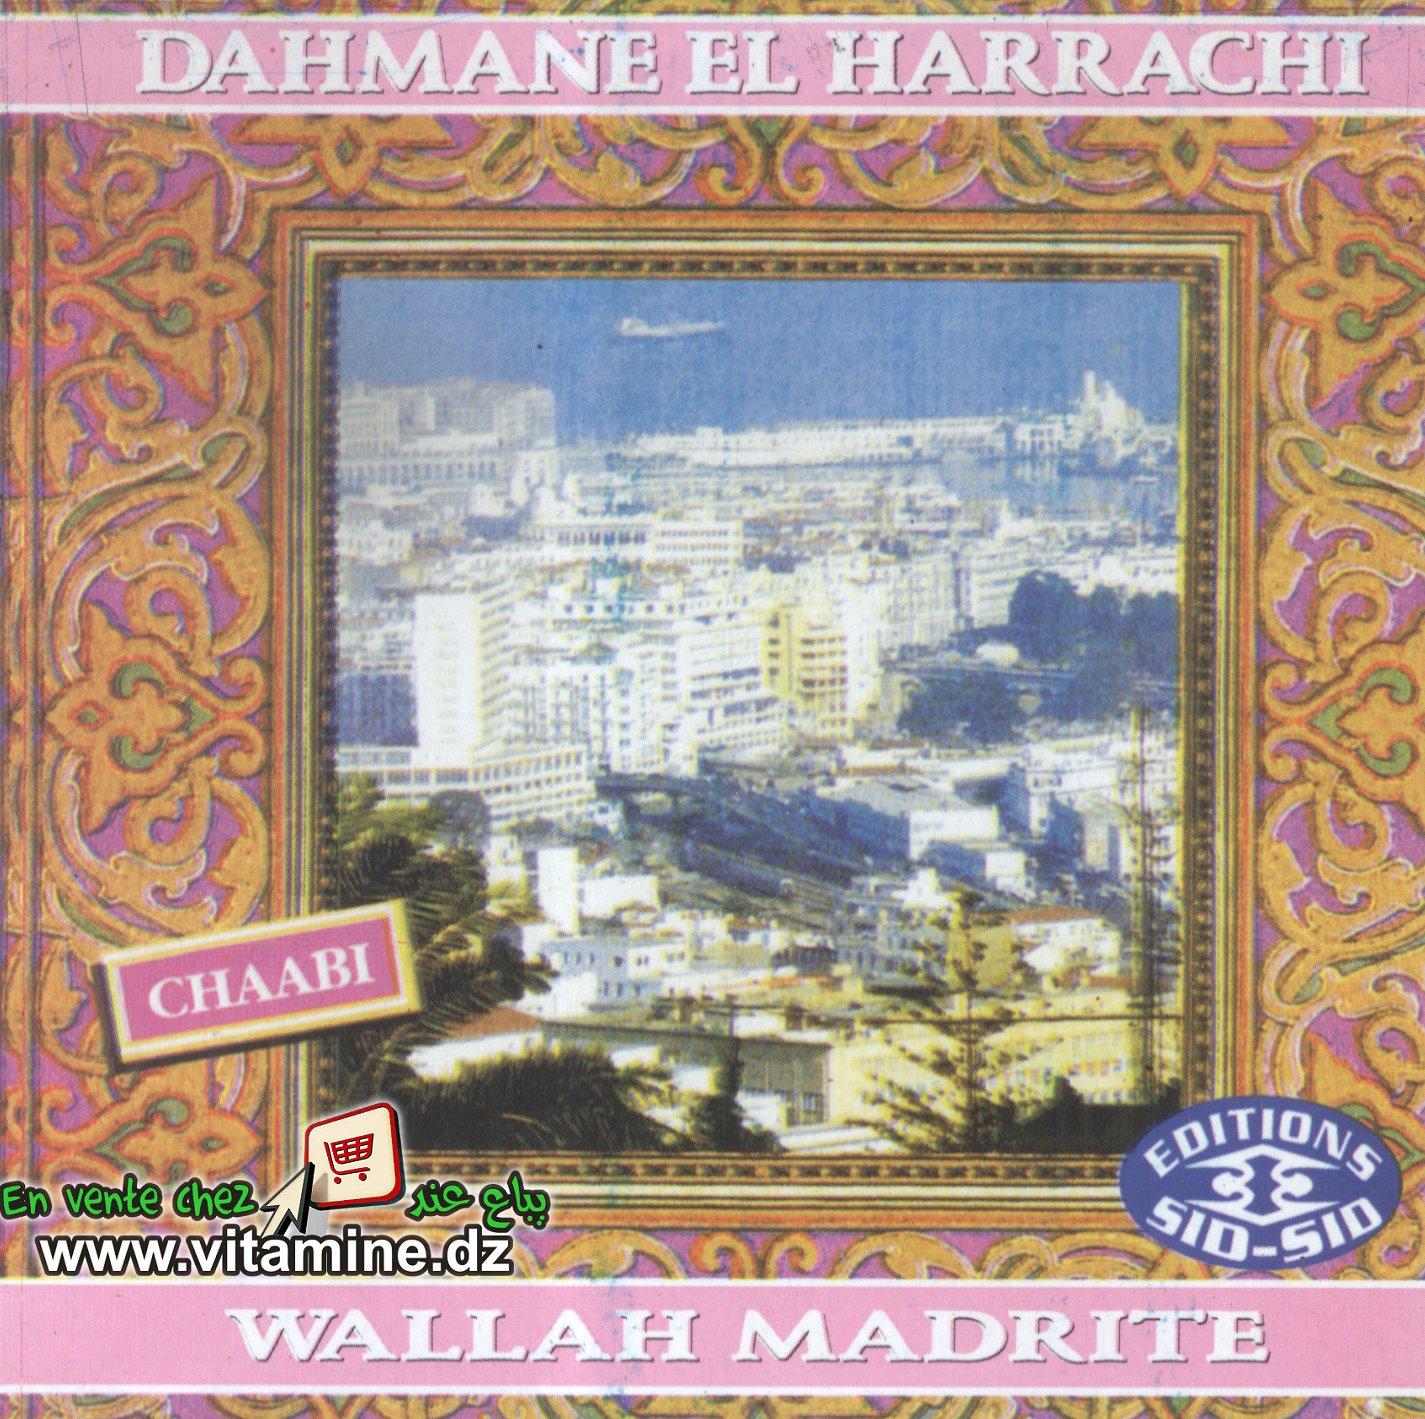 Dahmane El Harrachi - wallah madrite